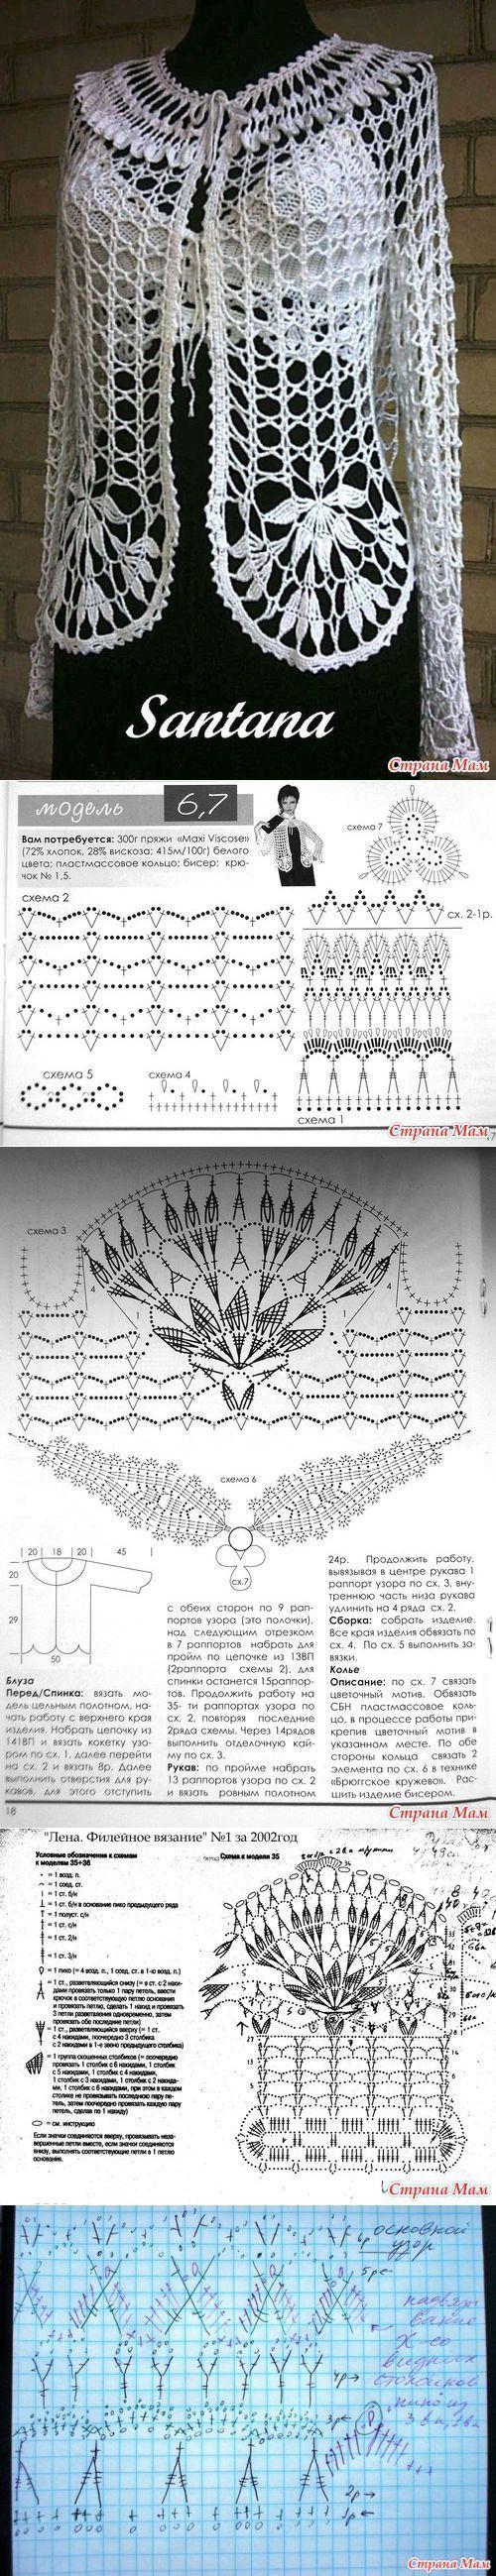 32a983840f1f209c049c895e41cedfeb.jpg (500×2599) [] #<br/> # #Crochet #Boleros,<br/> # #Crochet #Patterns,<br/> # #Used,<br/> # #Jacket,<br/> # #Ideas #Para,<br/> # #Blusas #Tejidas,<br/> # #Blusas #Crochet,<br/> # #Dresses,<br/> # #Crochet<br/>